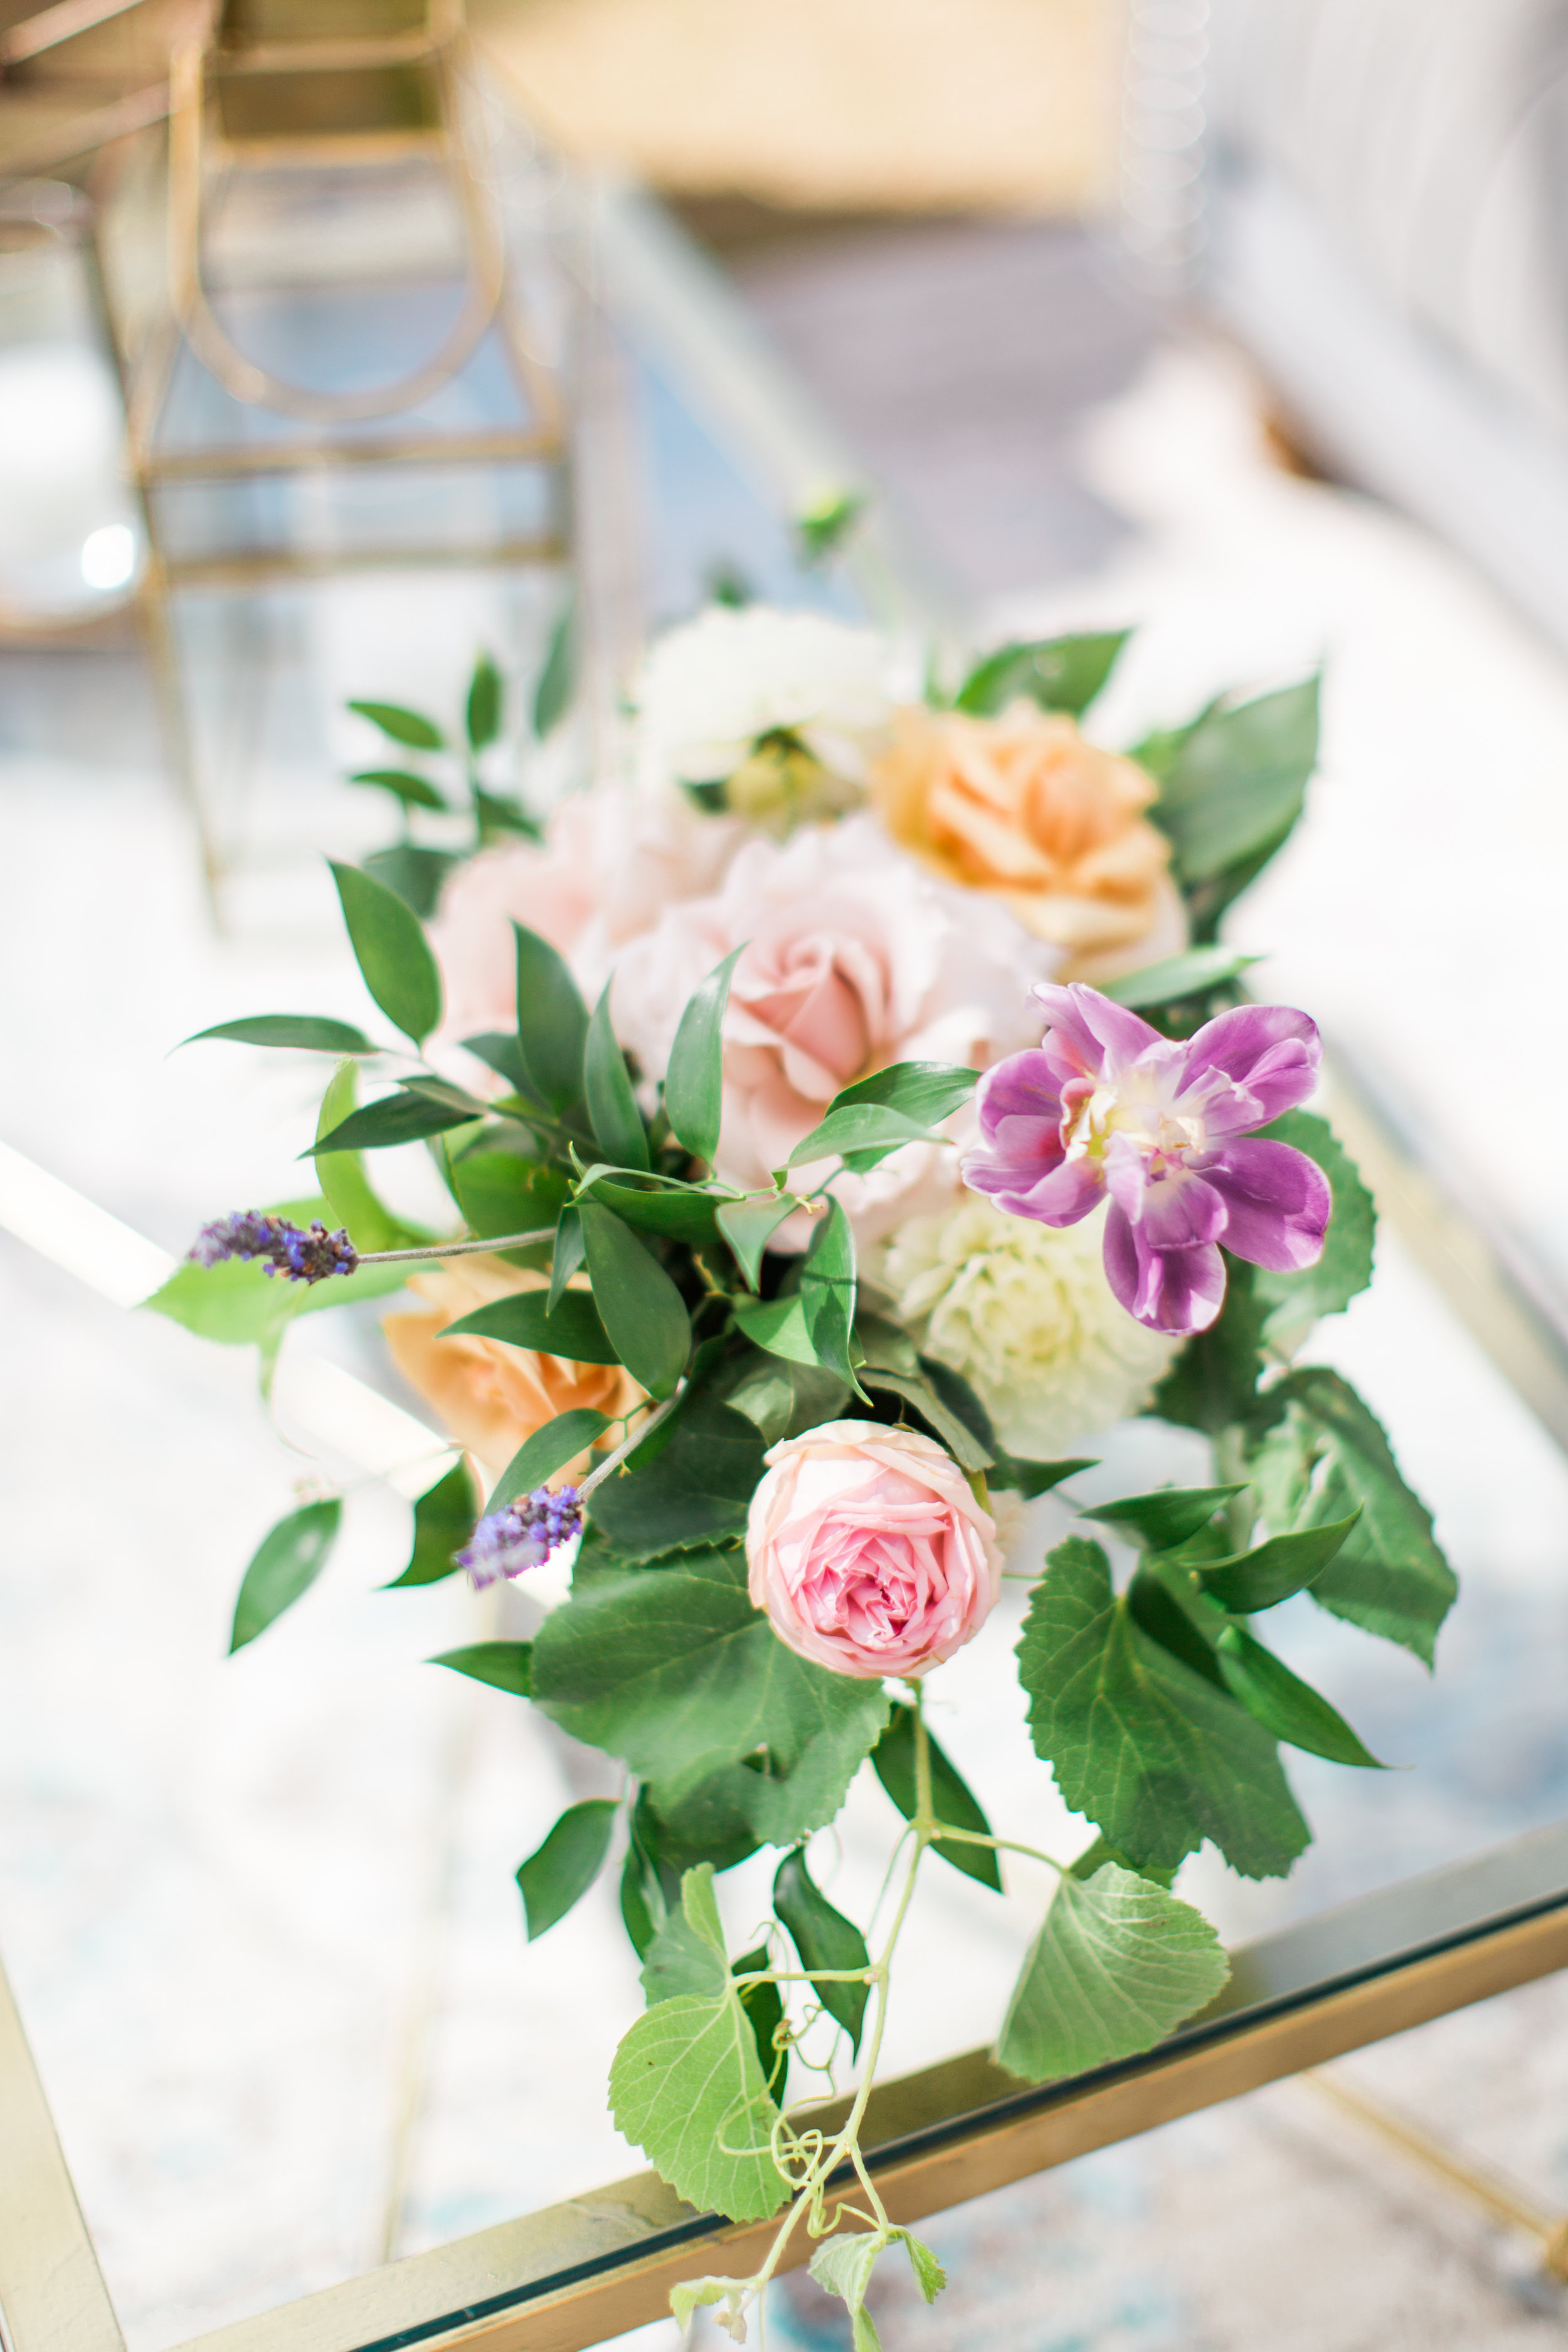 Blooms-breesa-lee-luxury-florist-aga-jones-tres-chic-affairs-san-diego-wedding-classic-coast-catering-33).jpg